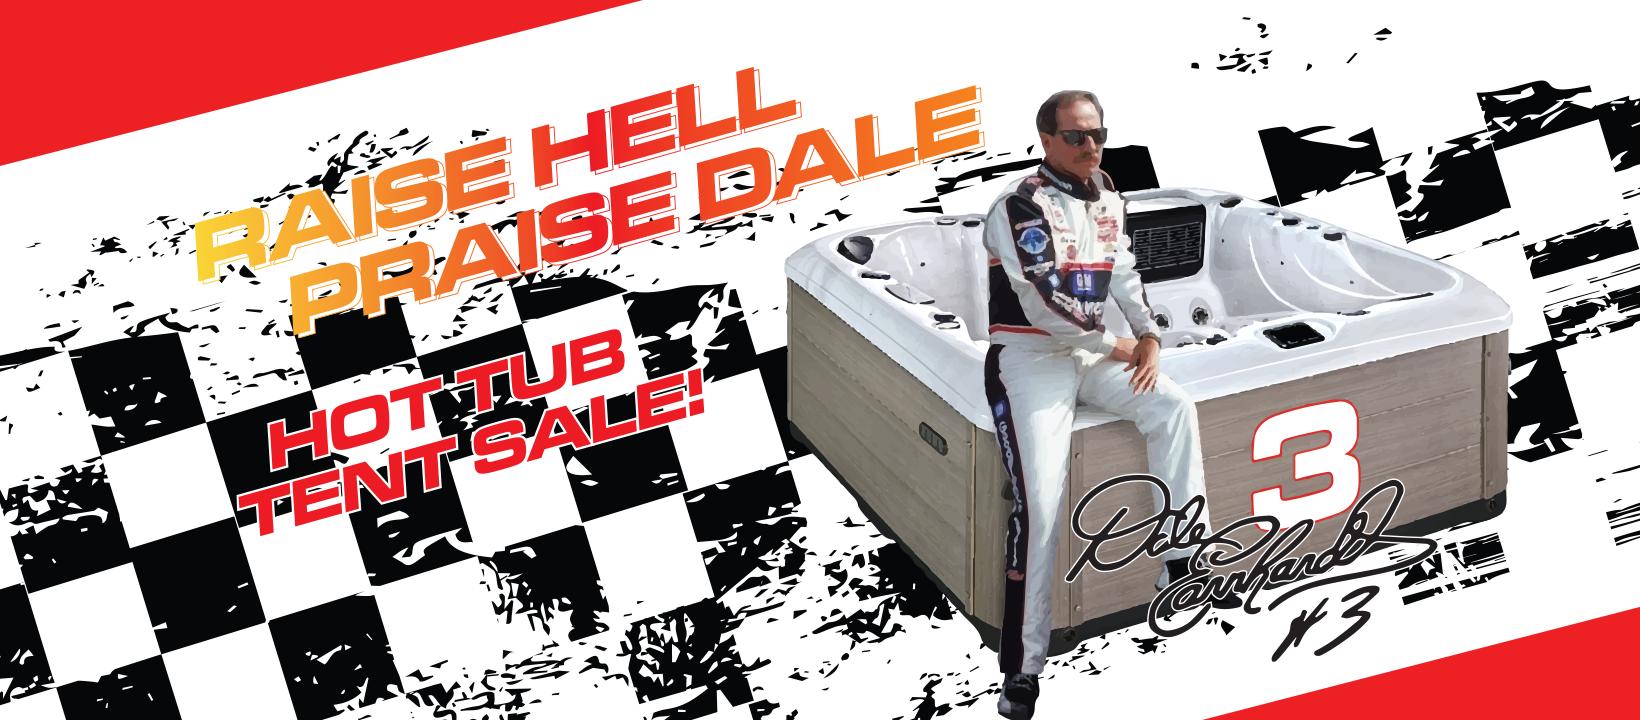 Raise Hell Praise Dale Hot Tub Tent Sale!